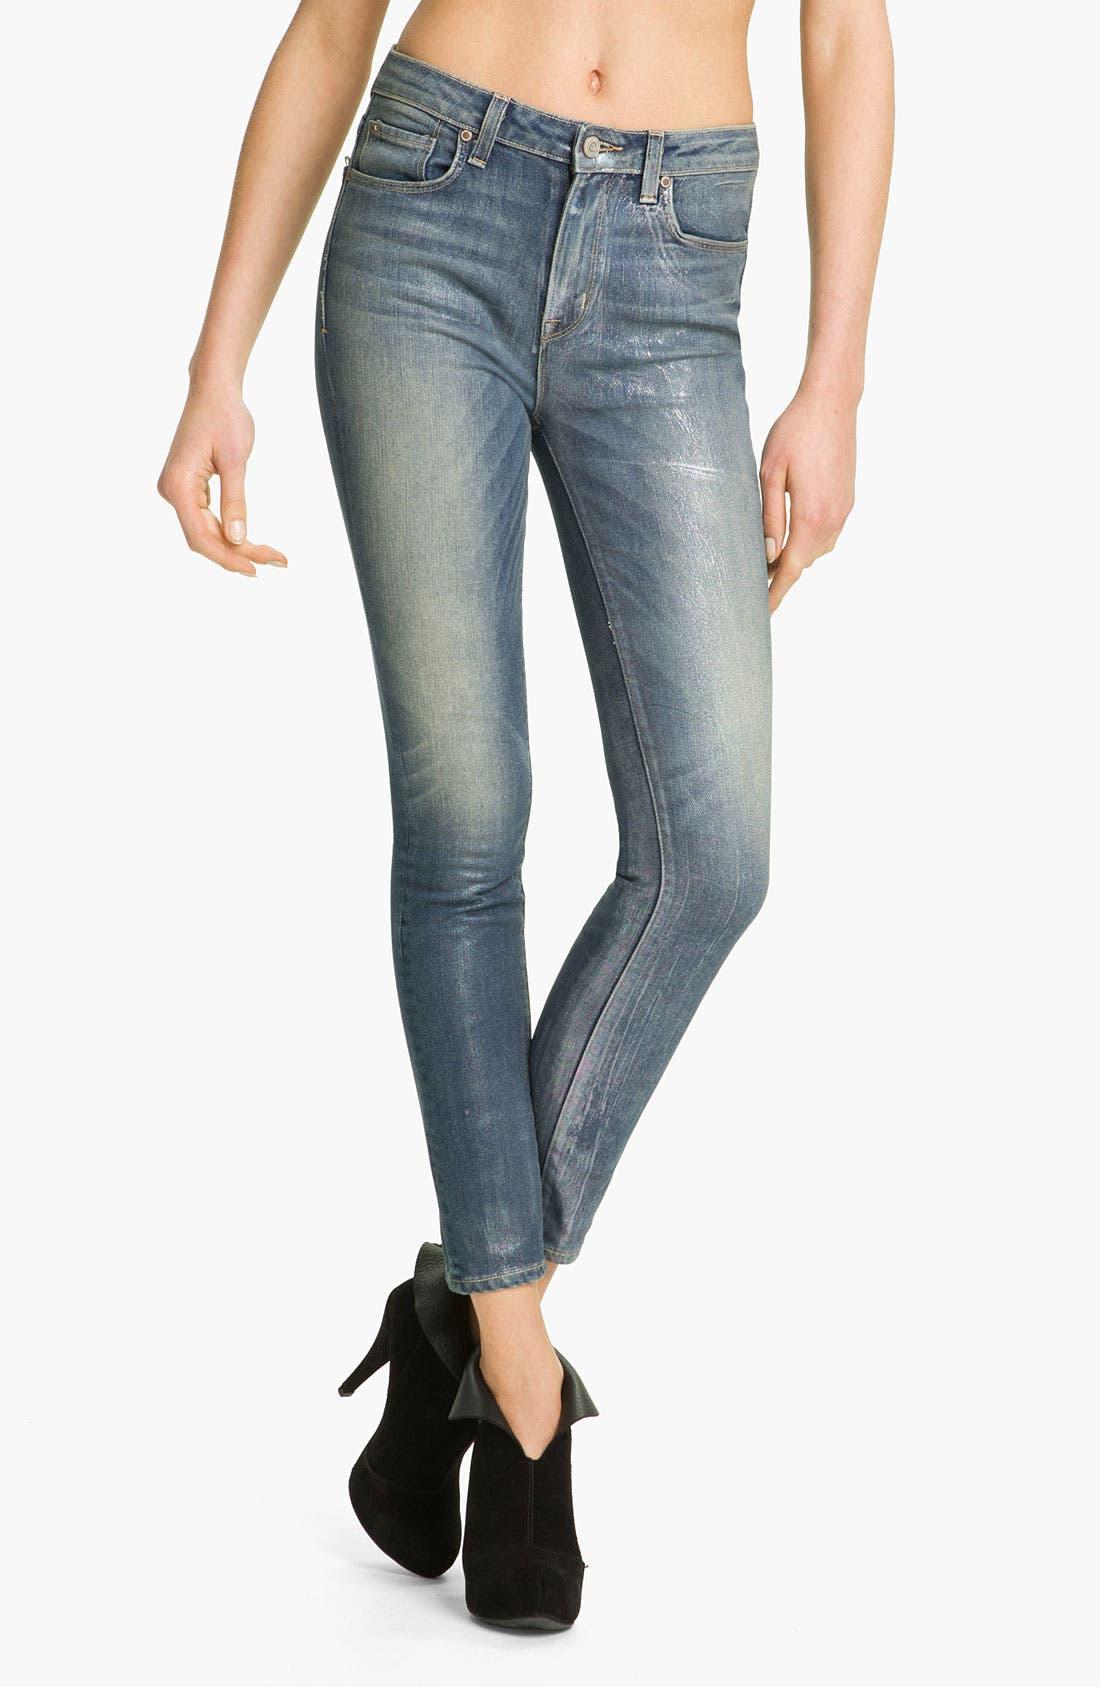 Main Image - MARC BY MARC JACOBS 'Sofie' Cigarette Jeans (Vintage Pearl)